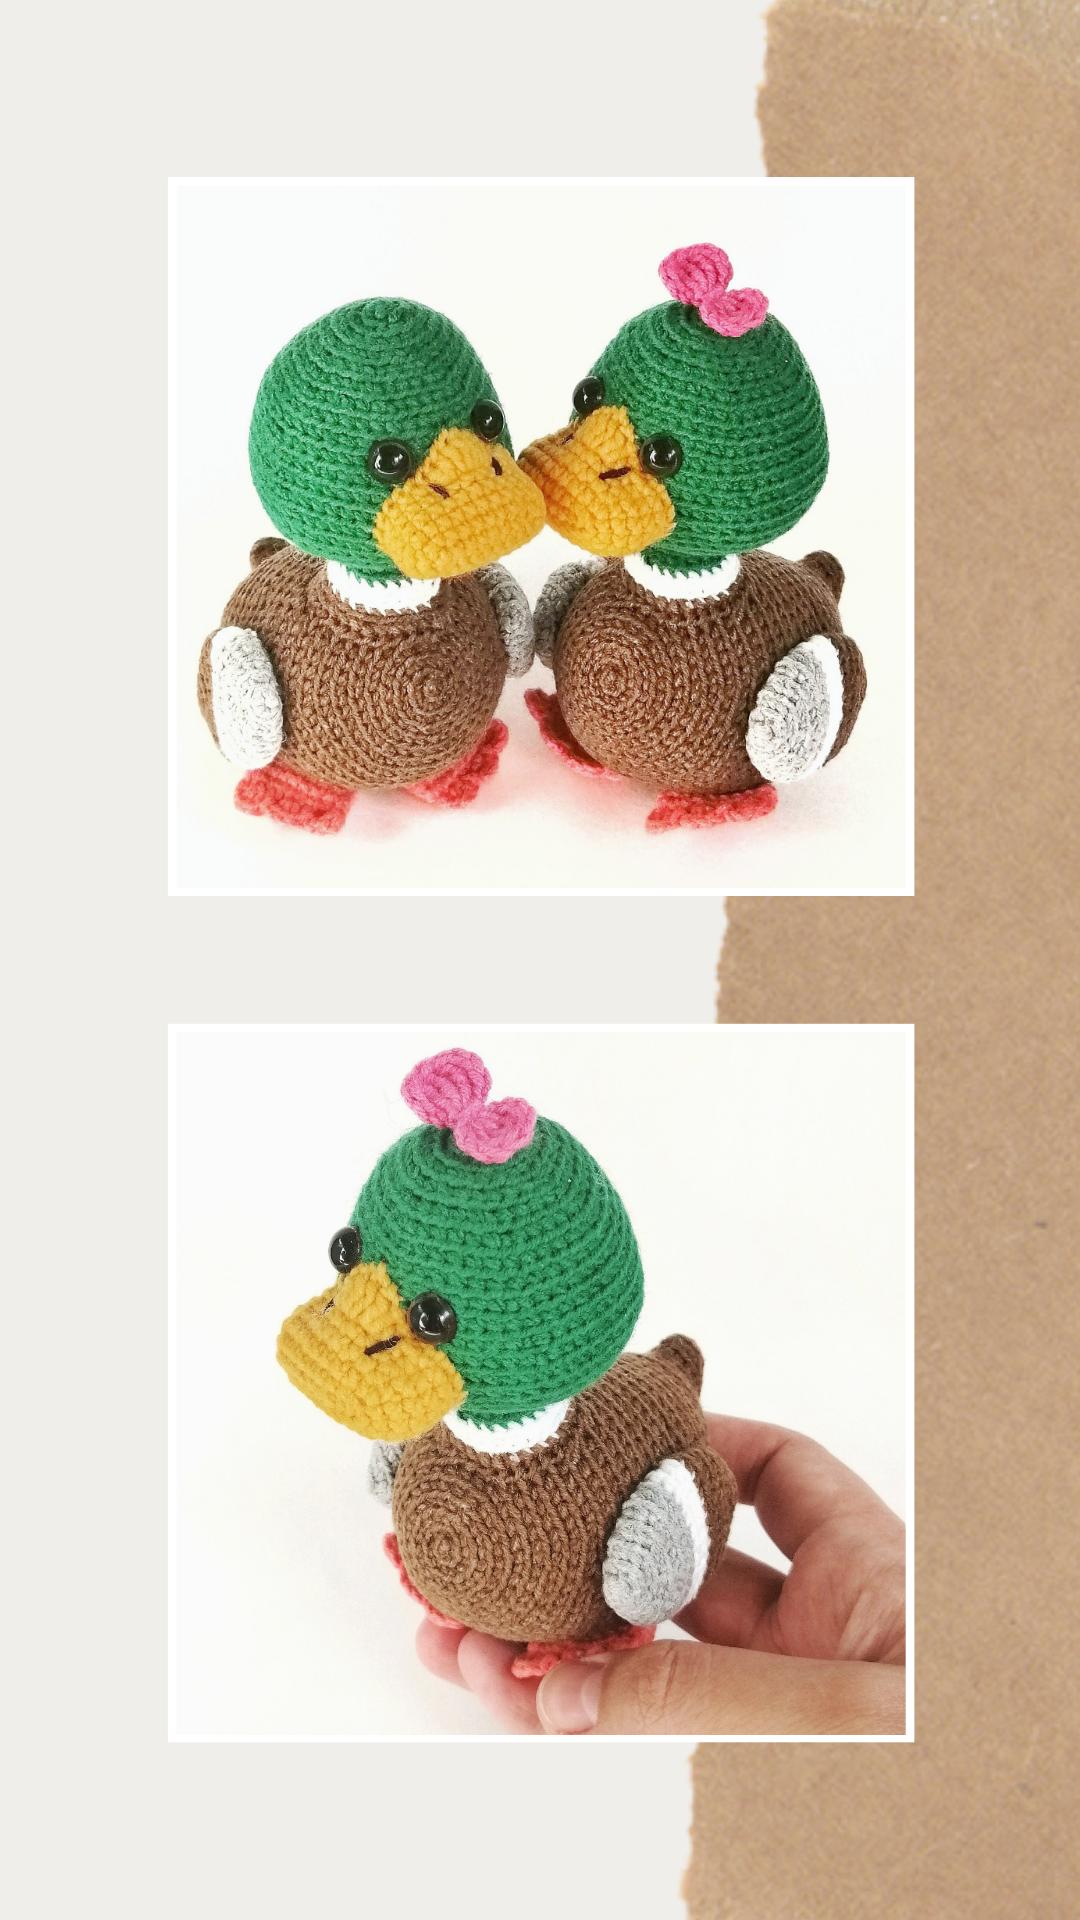 CROCHET PATTERN ducks - amigurumi duck - PDF crochet pattern with Instant Download - Easy to ...